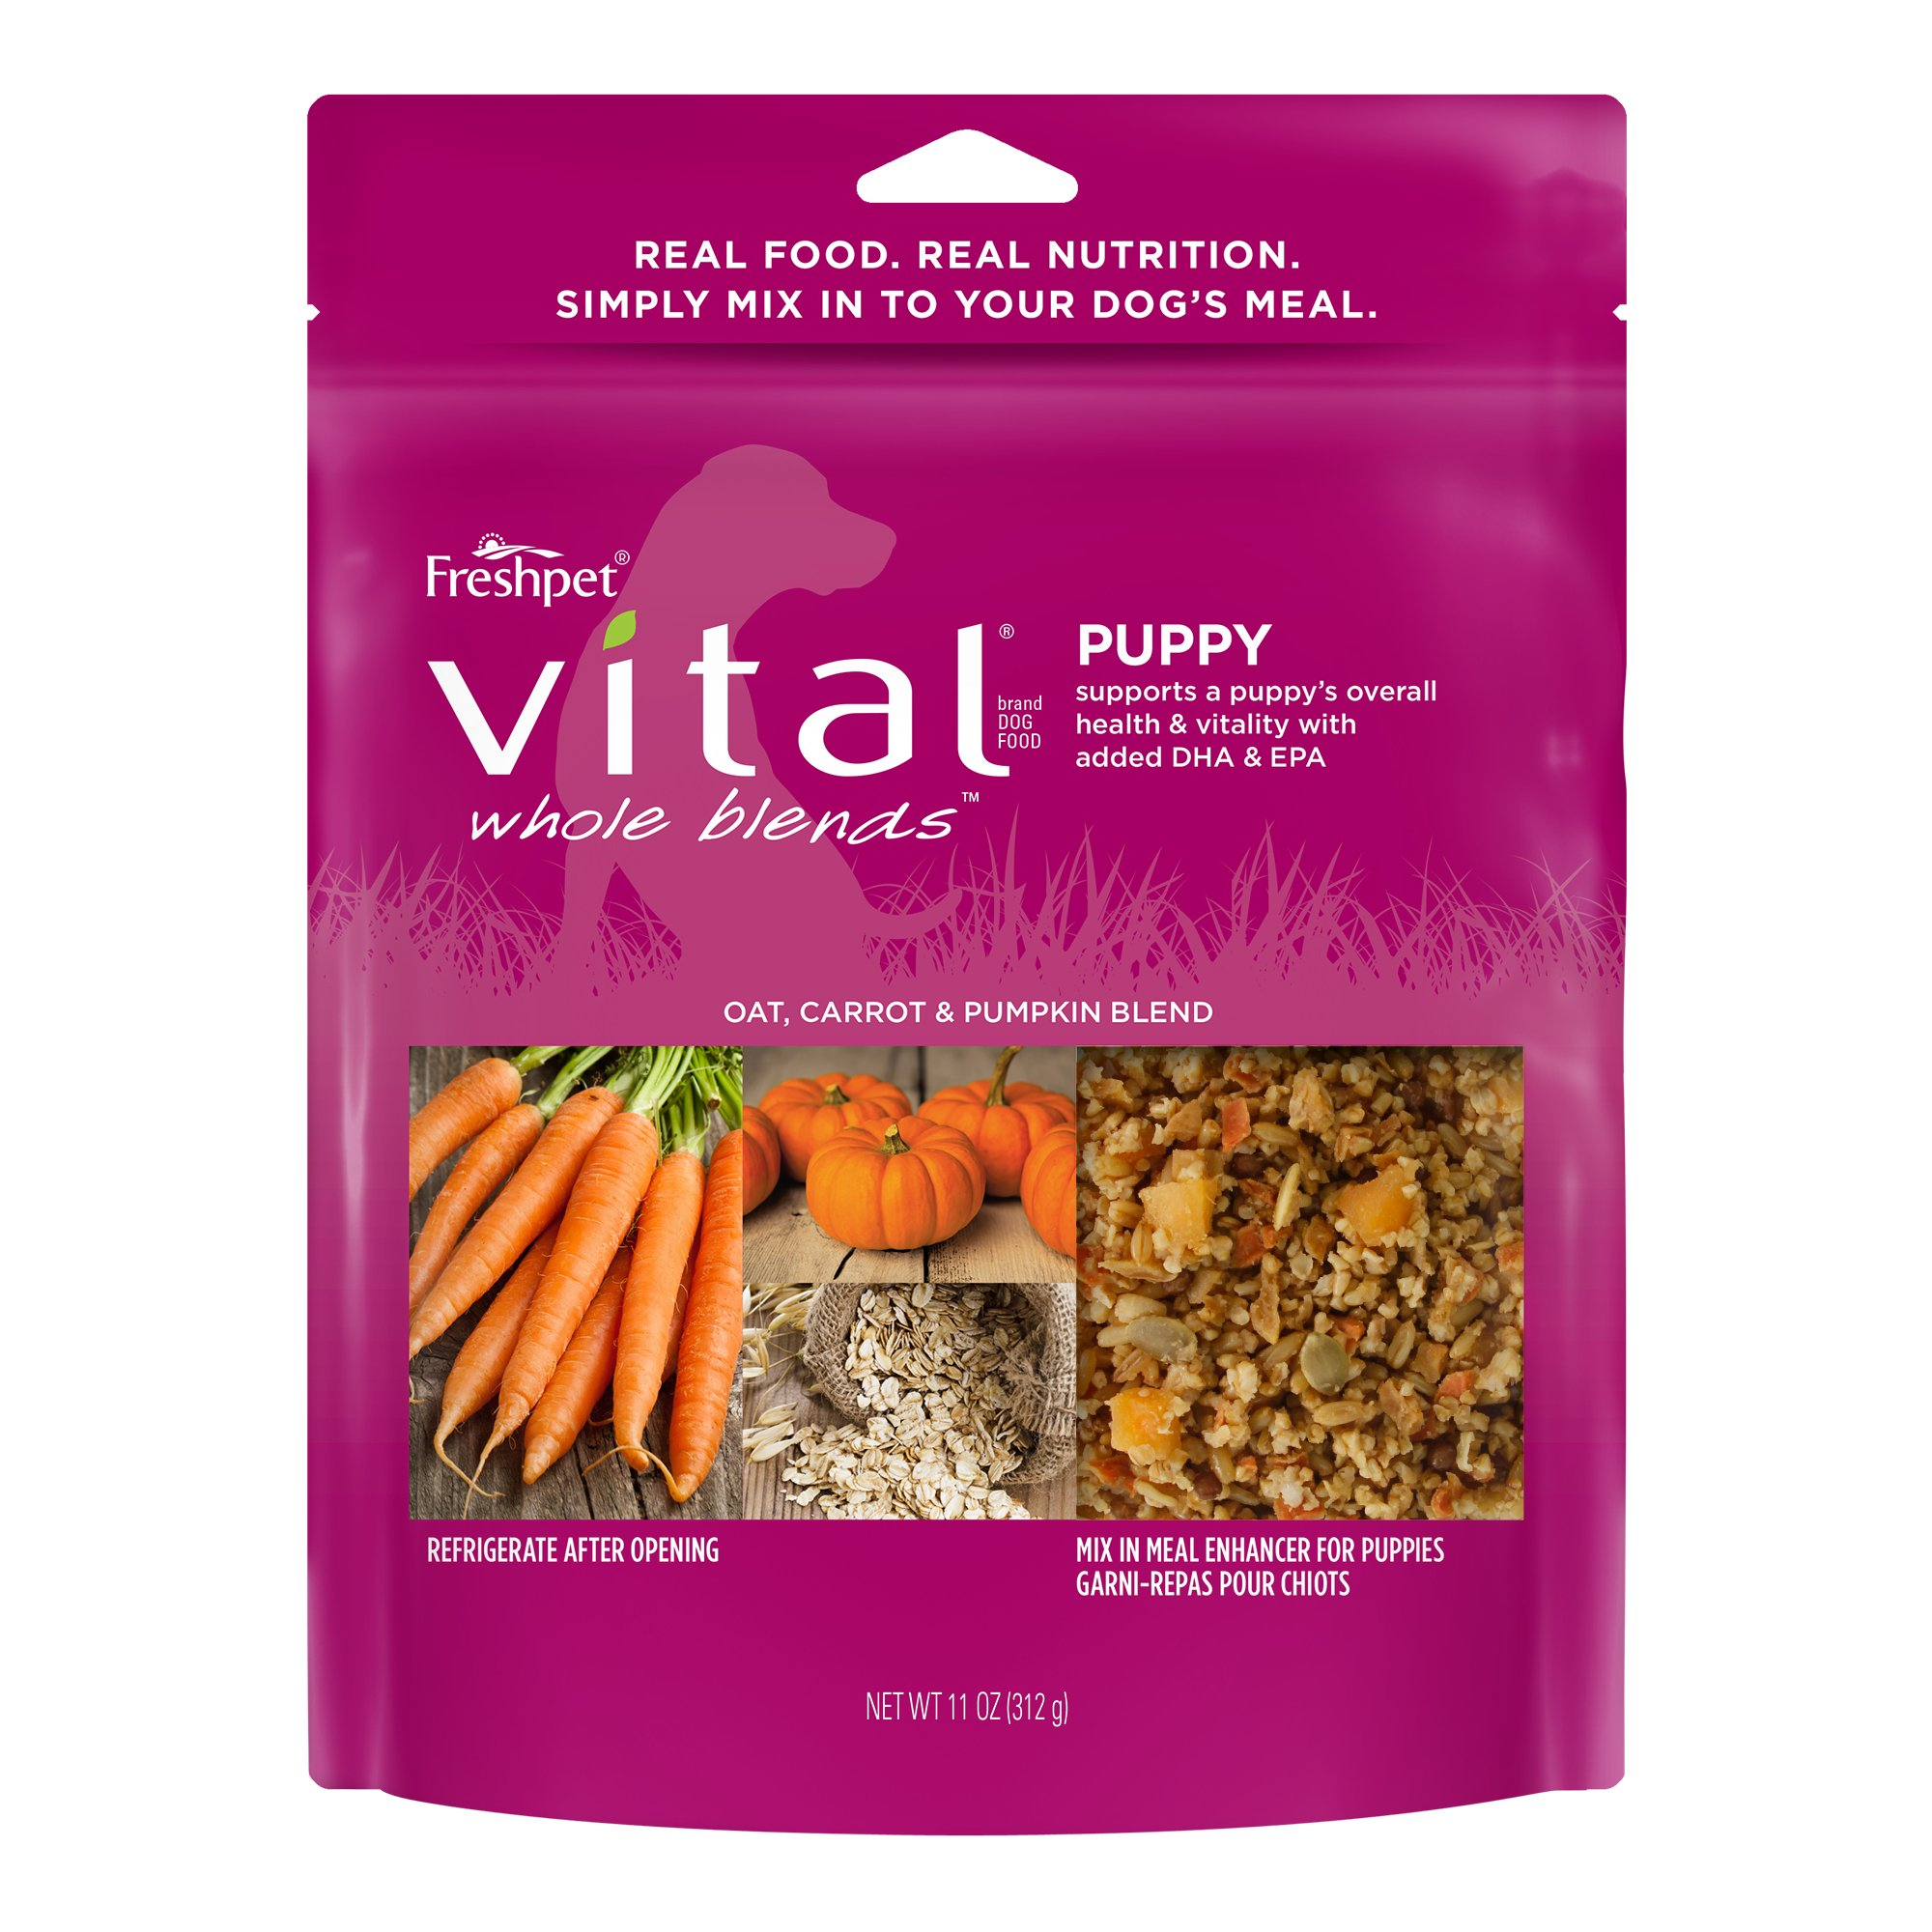 Freshpet Vital Whole Blends Puppy Dog Food